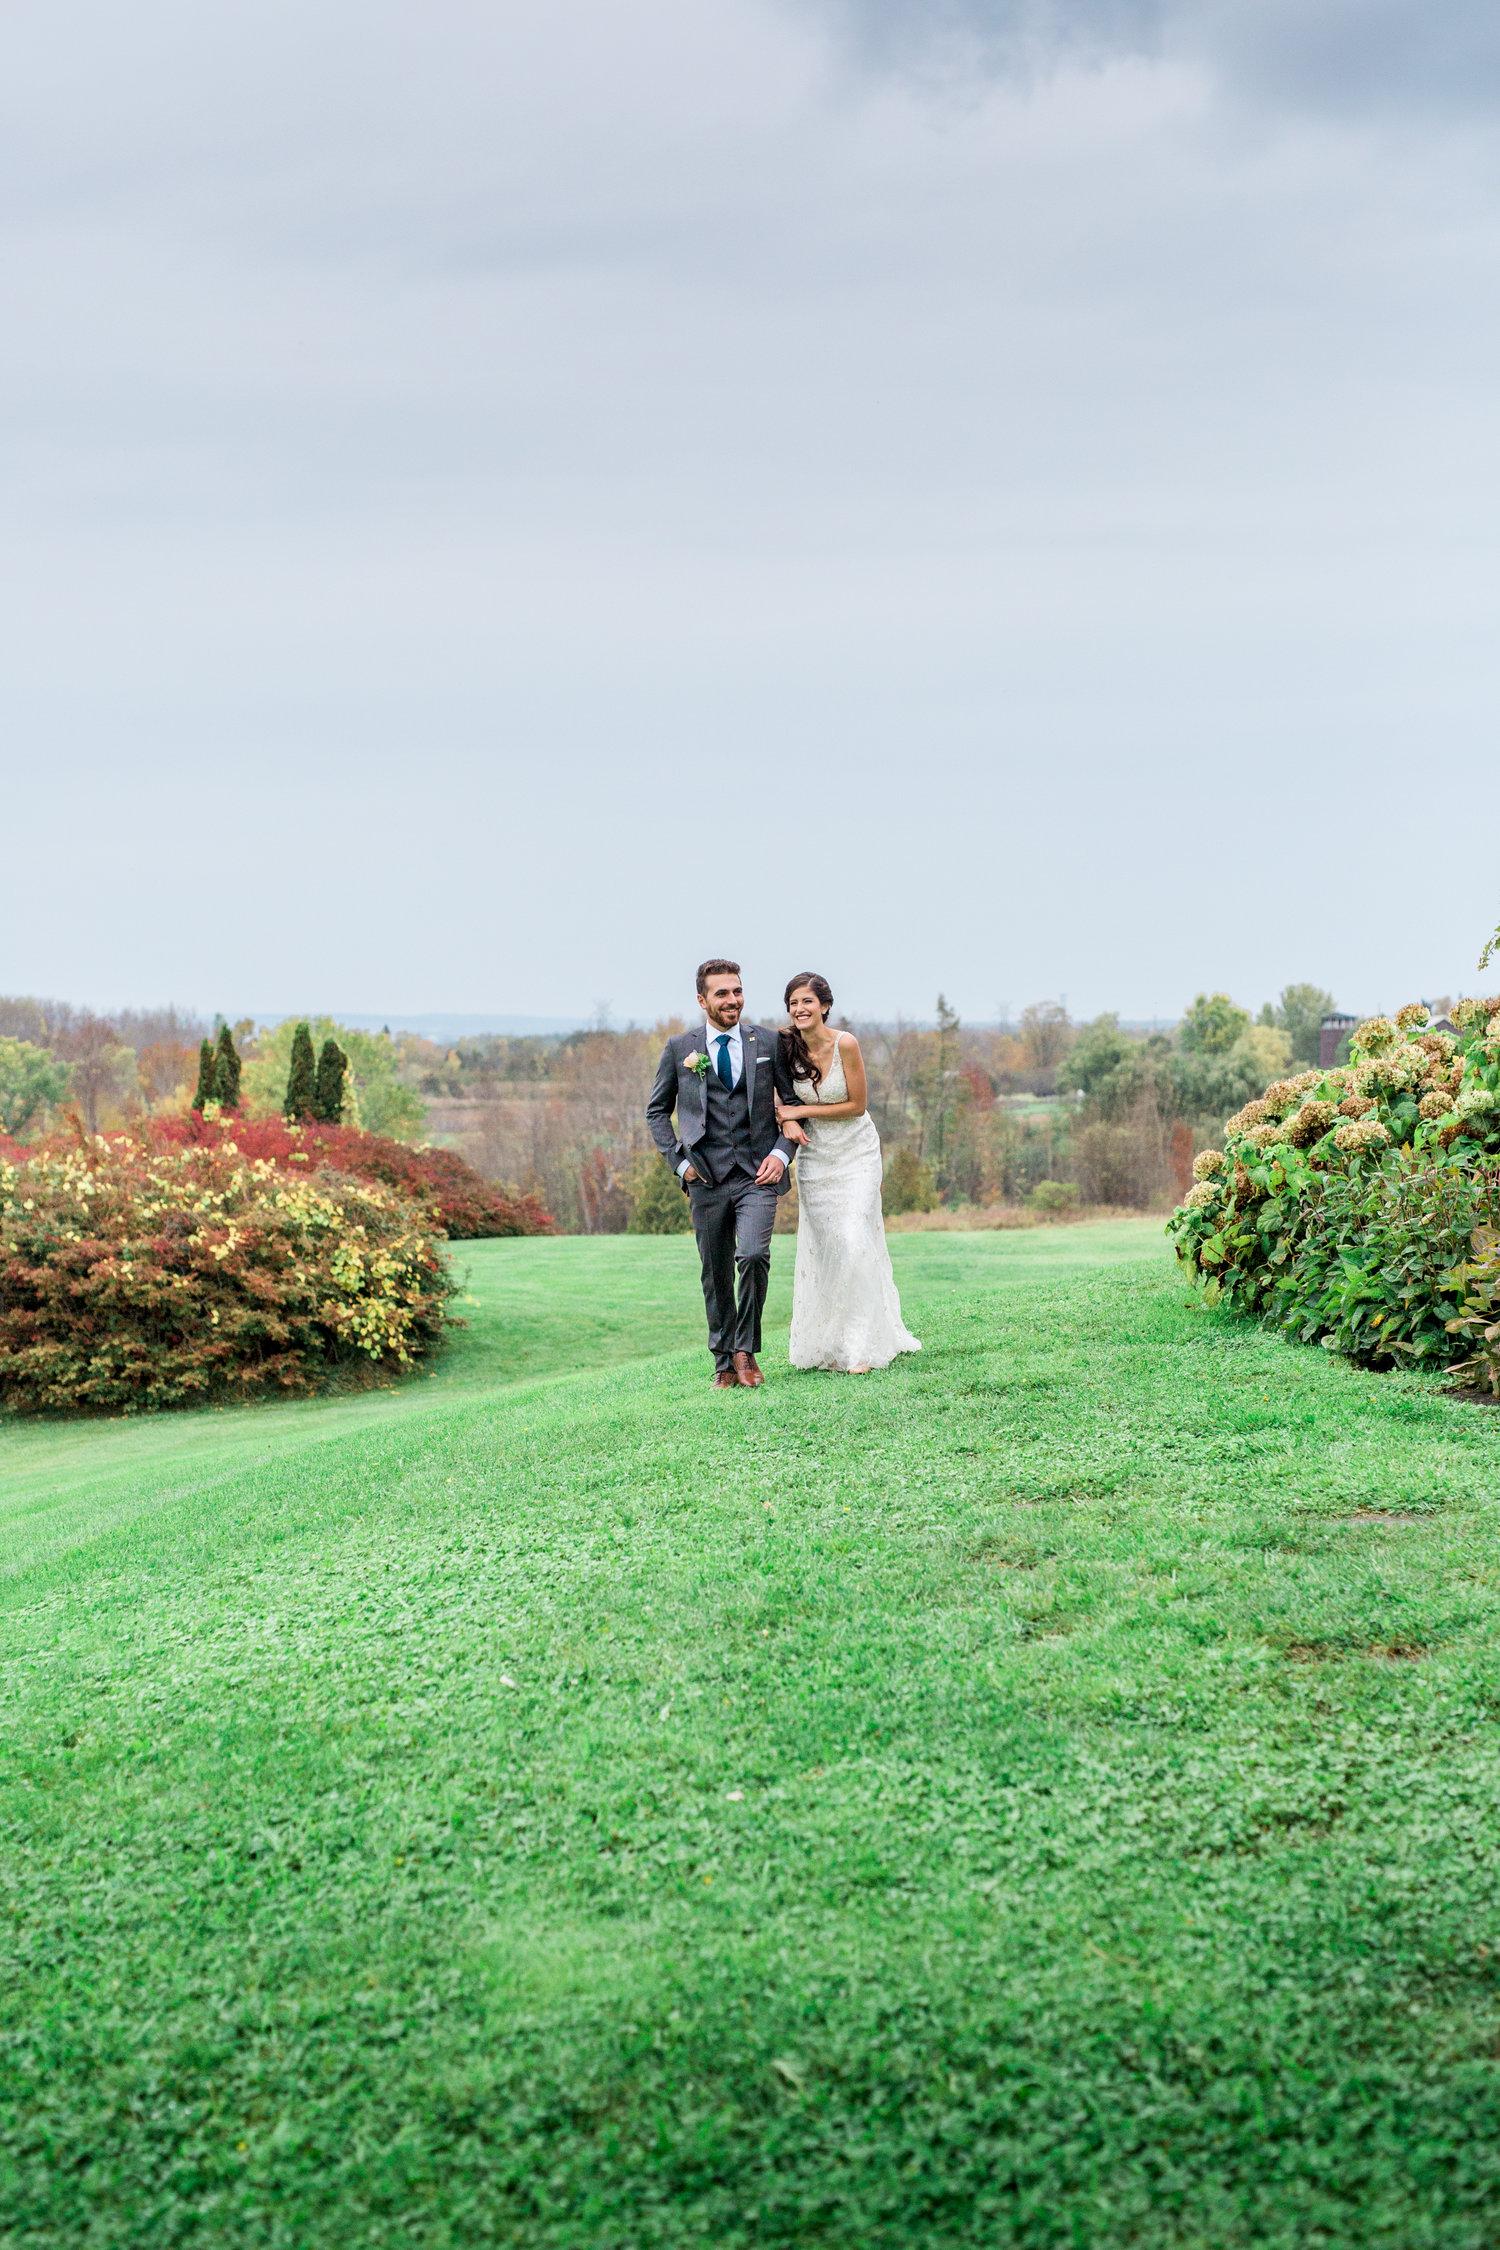 Amir-Golbazi-Danielle-Giroux-Photography_Toronto-Wedding_Cedarwood_Rachel-Paul_449.jpg